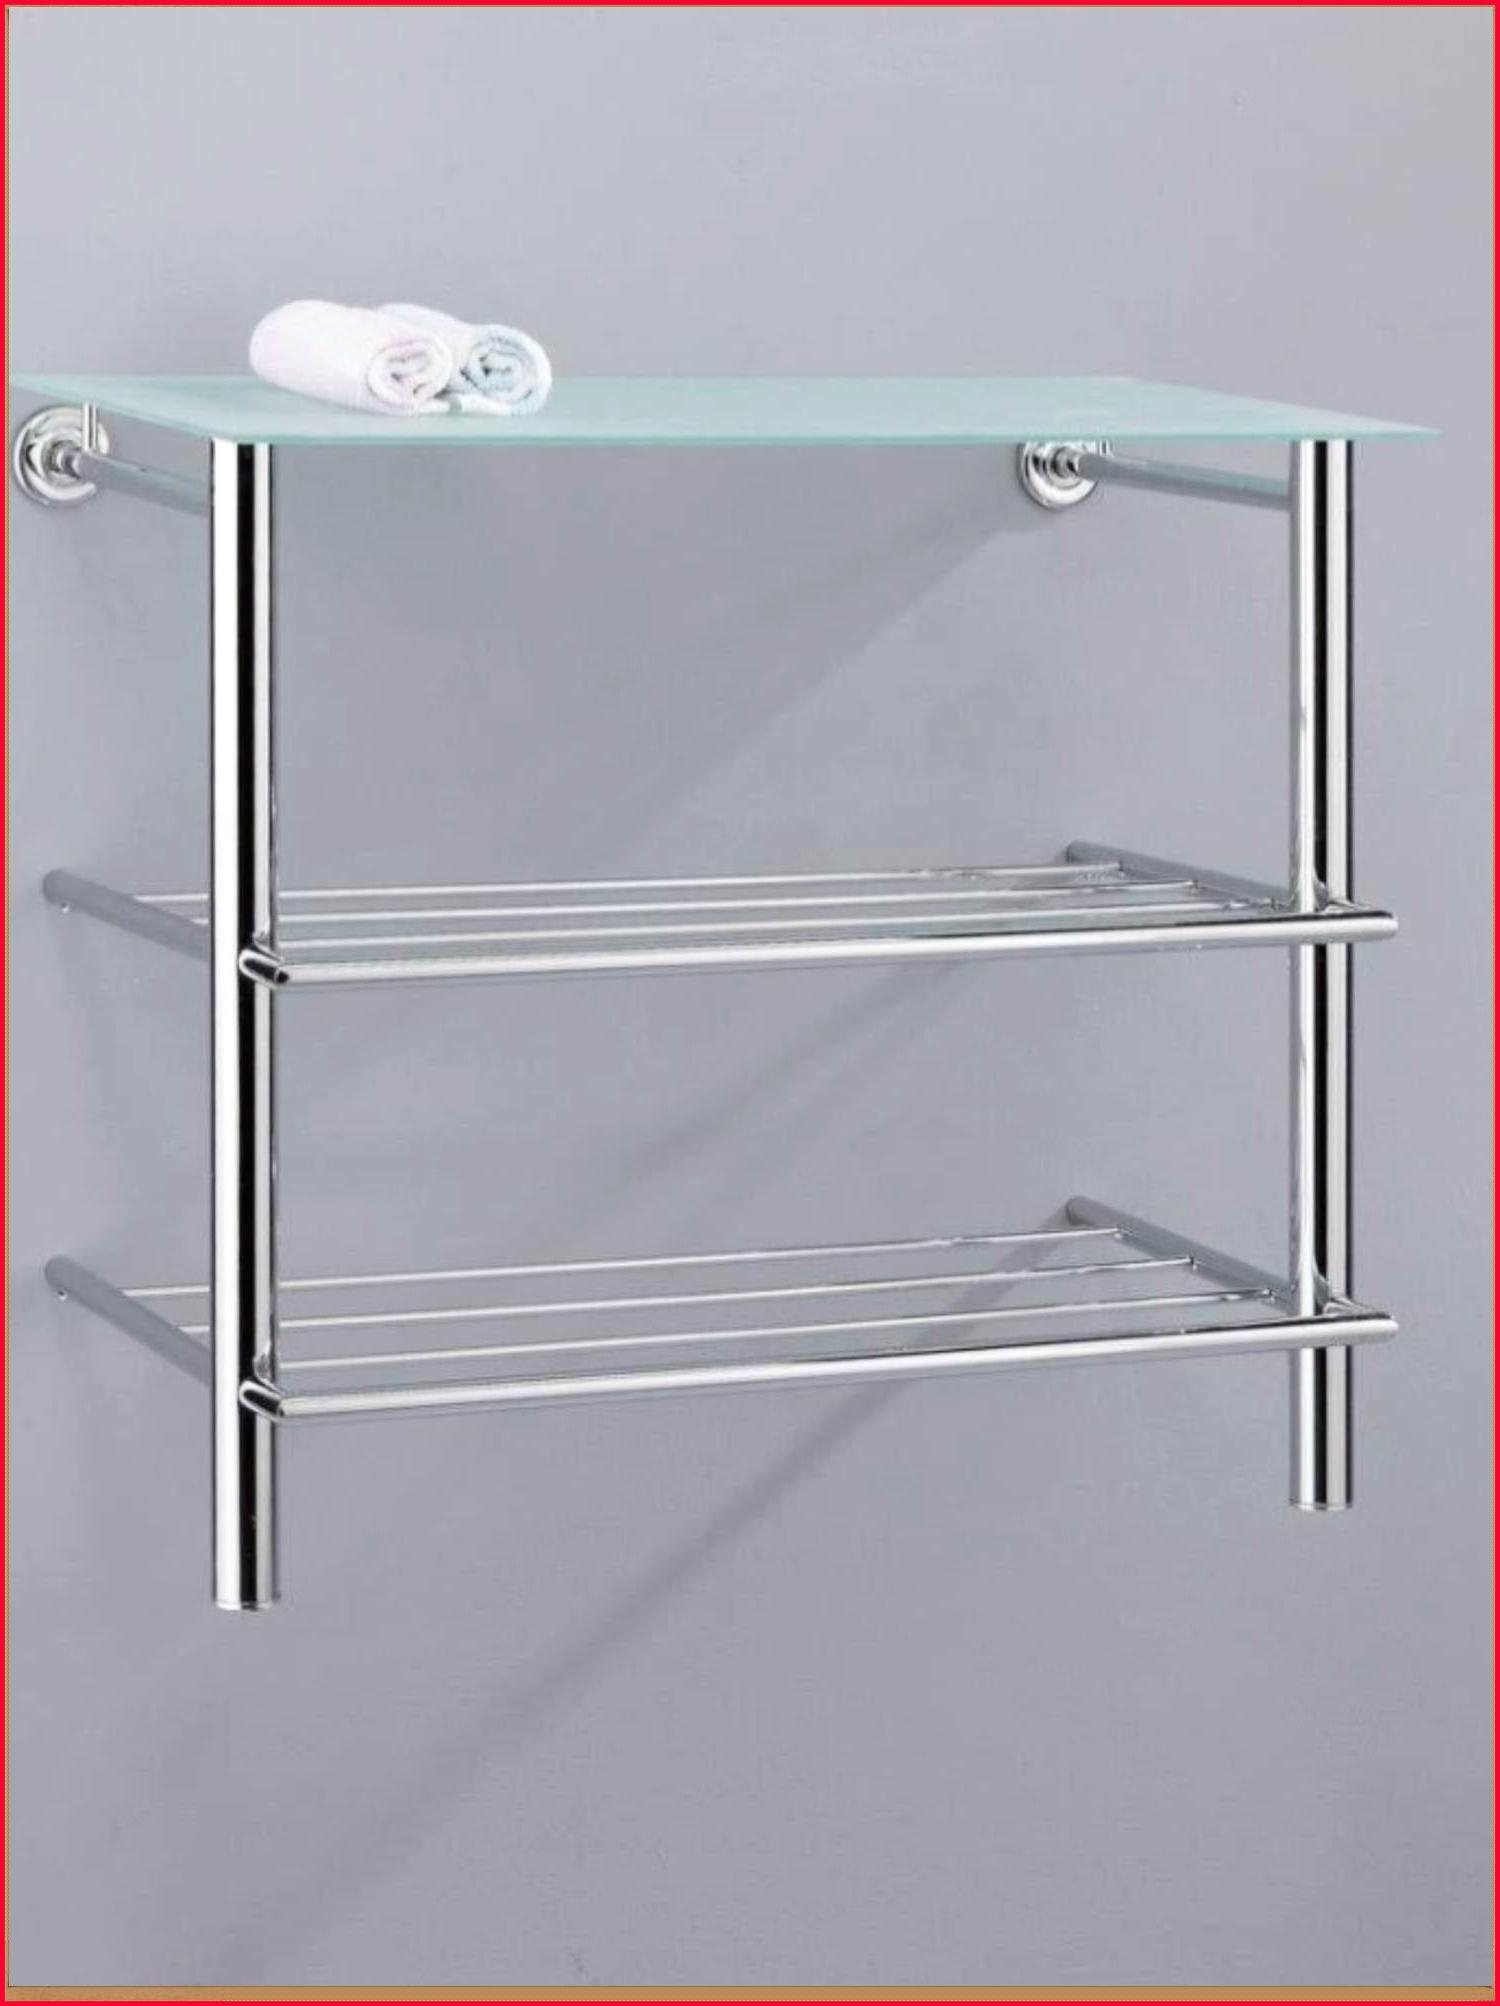 Muebles Auxiliares De Baño Carrefour Y7du Estanterias Baà O Carrefour Baldas Para BaO Rieles Para